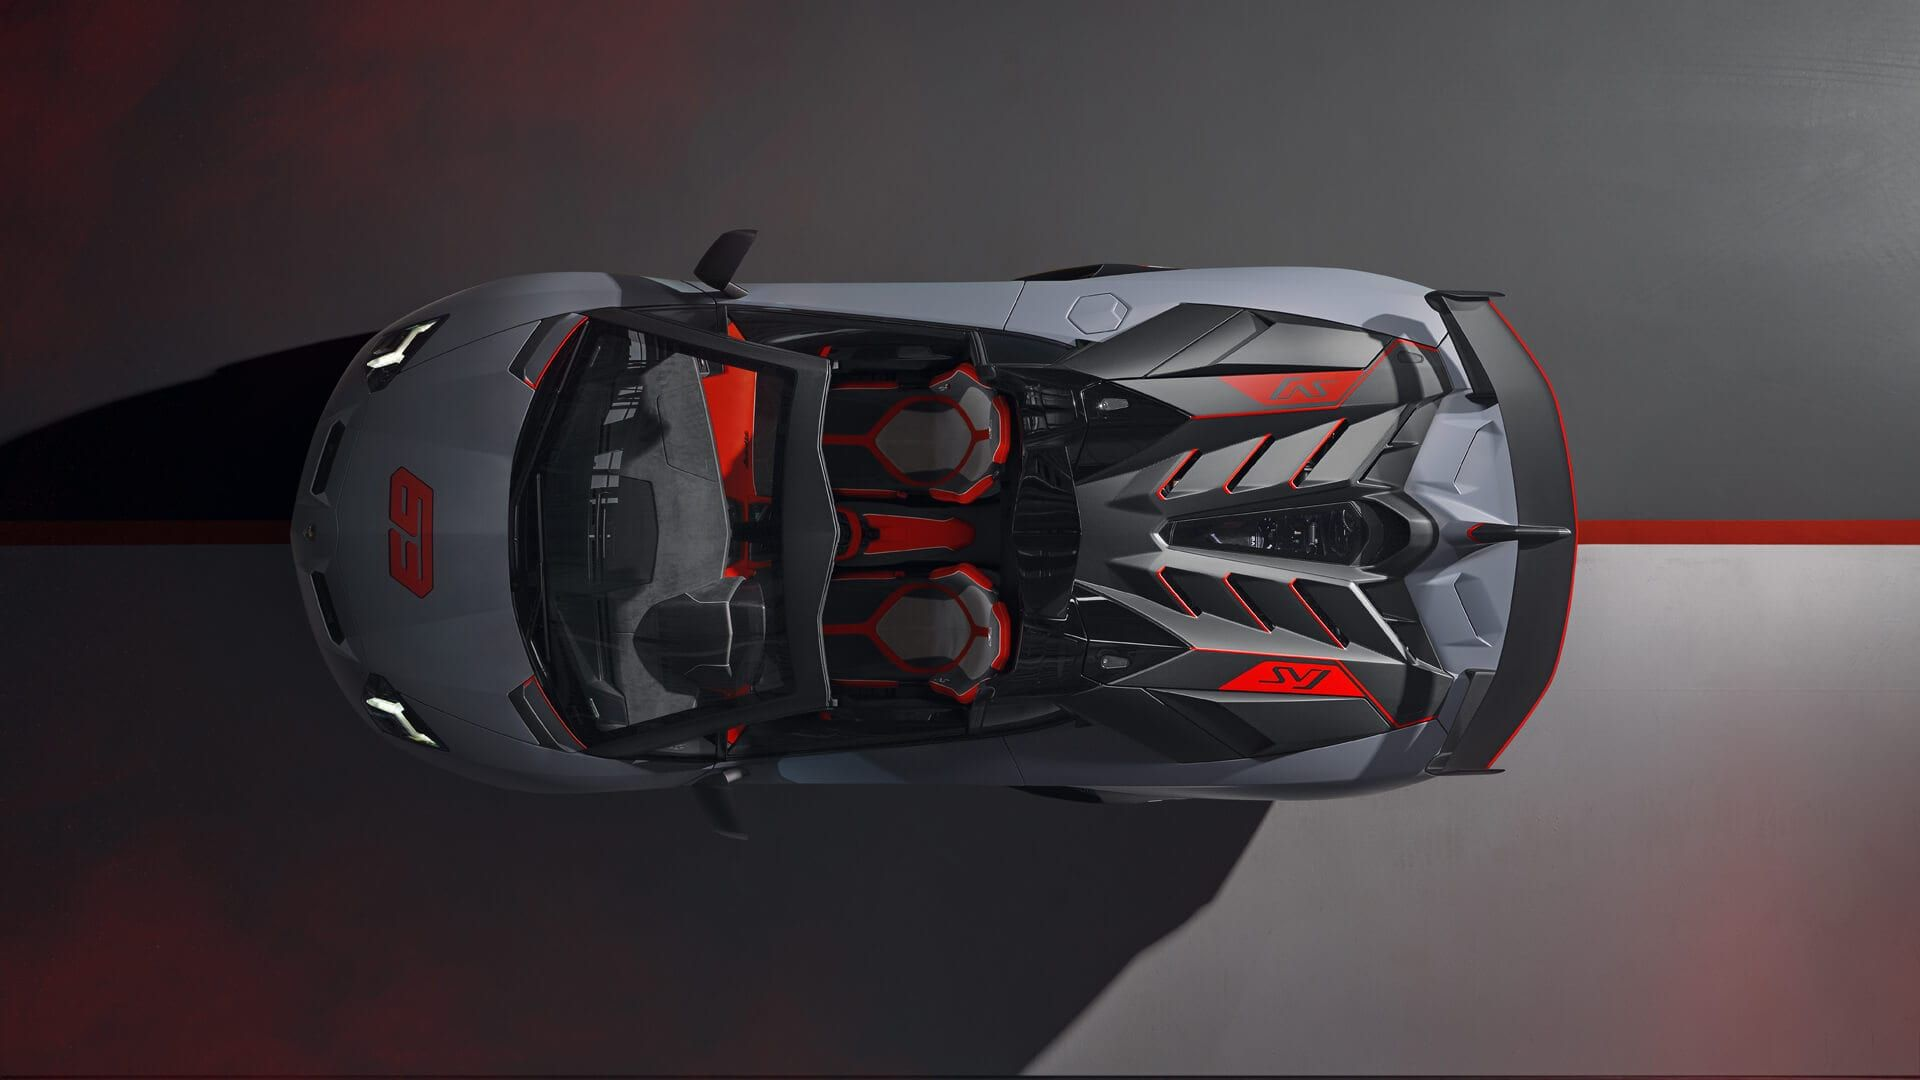 Lamborghini Aventador S Curtain Call Is The Svj63 Roadster